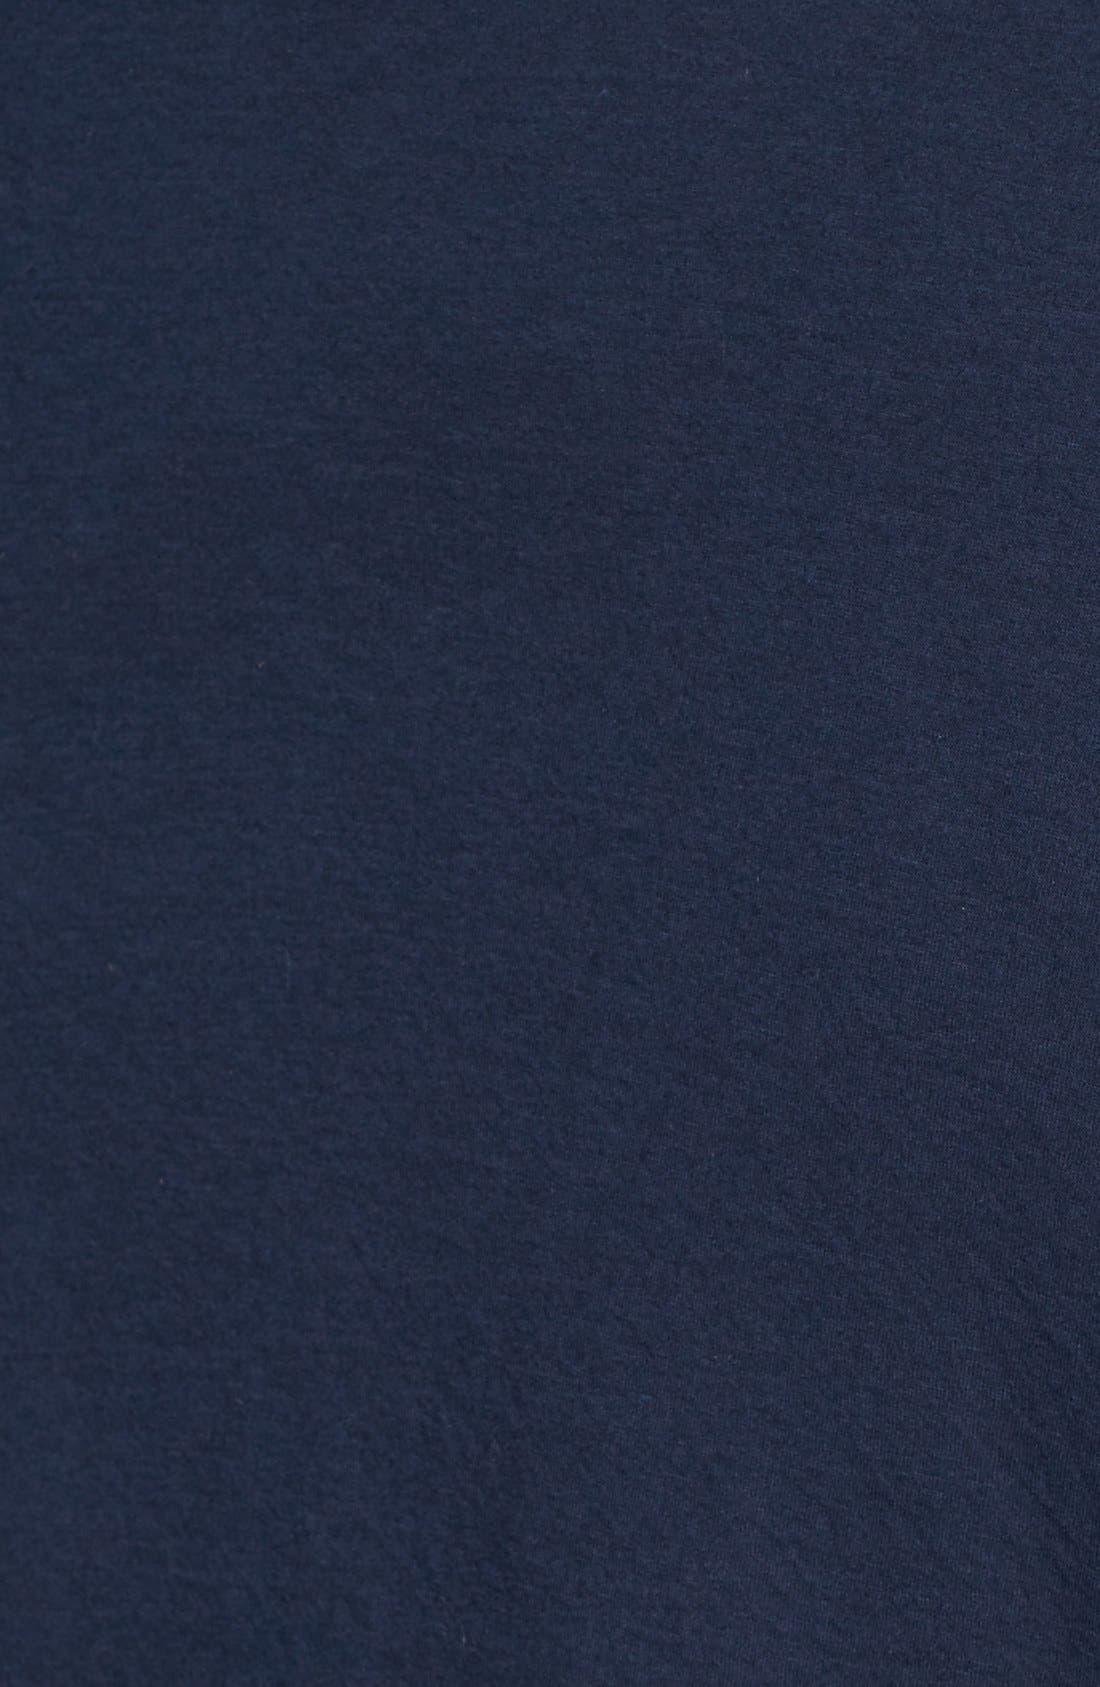 Long Sleeve Crewneck T-Shirt,                             Alternate thumbnail 18, color,